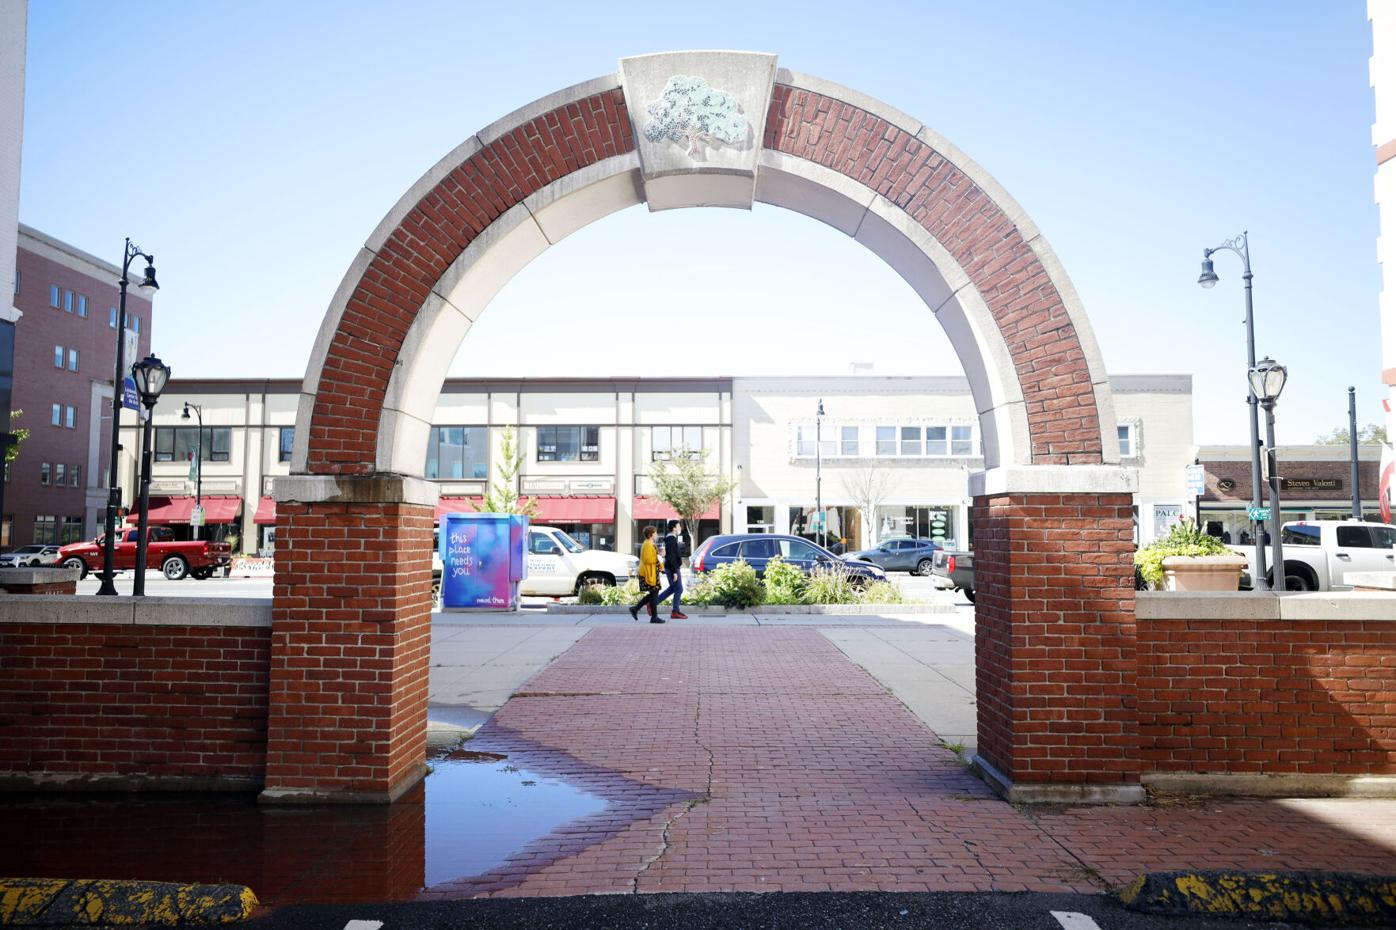 palace park brick arch